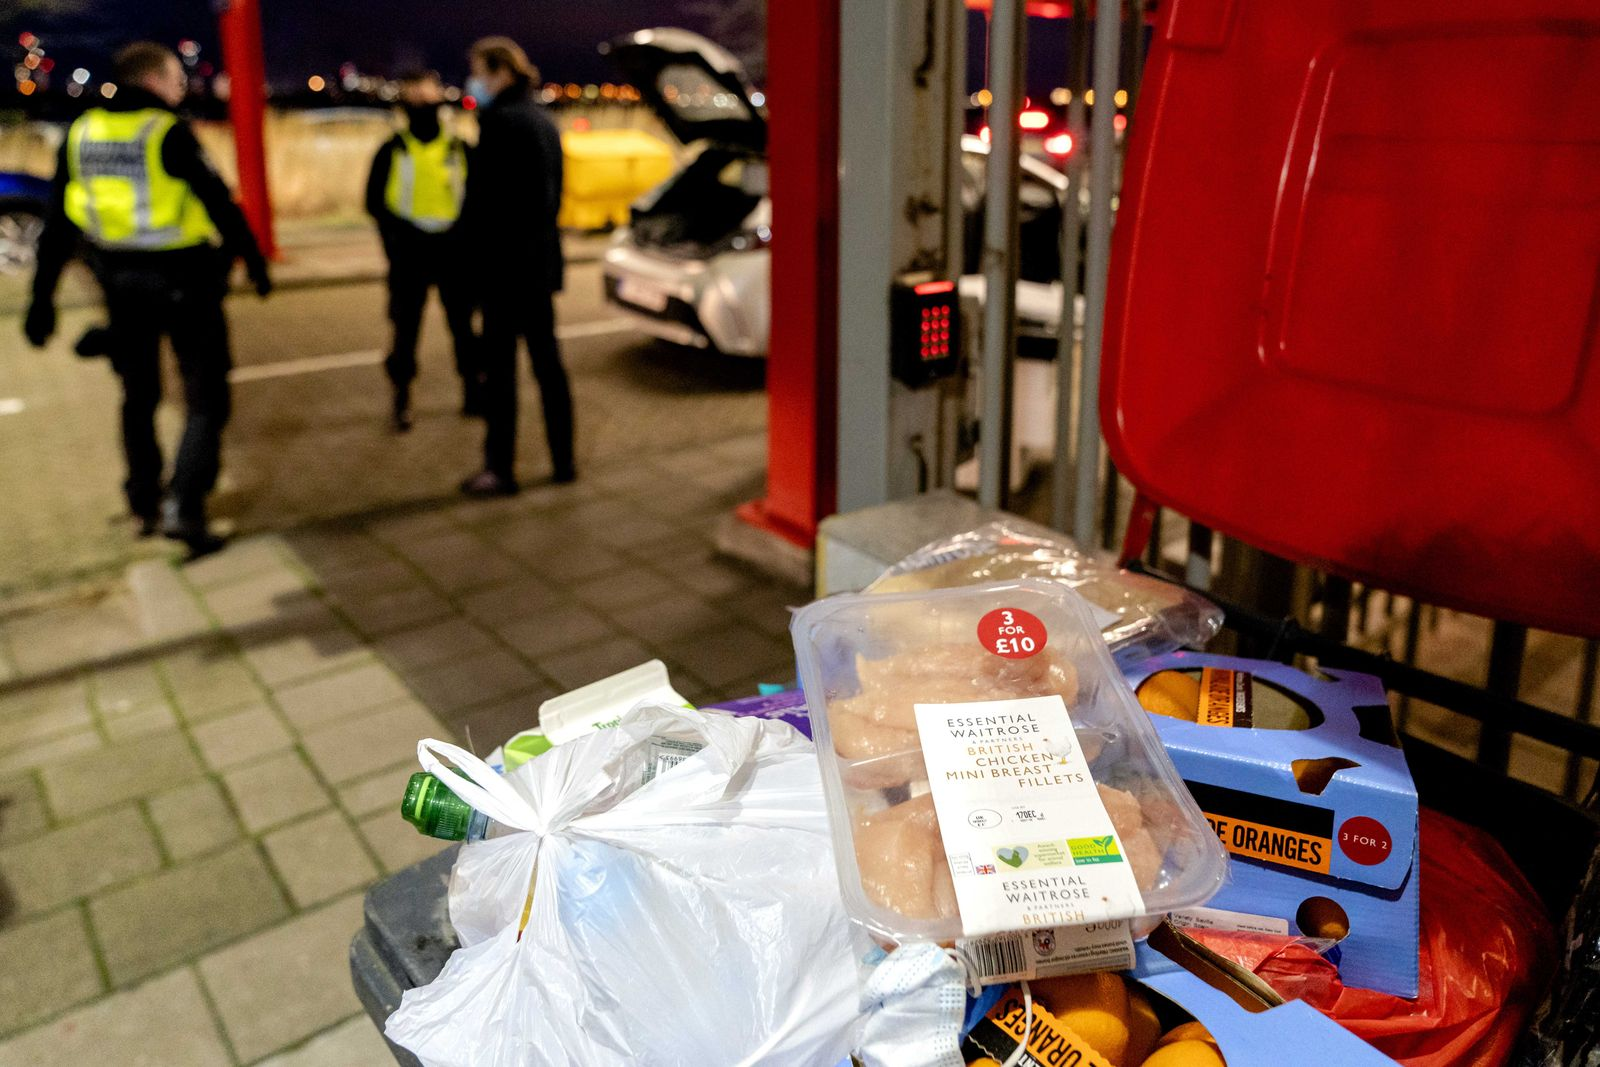 Customs checks travelers from the United Kingdom, Hoek Van Holland, Netherlands - 06 Jan 2021